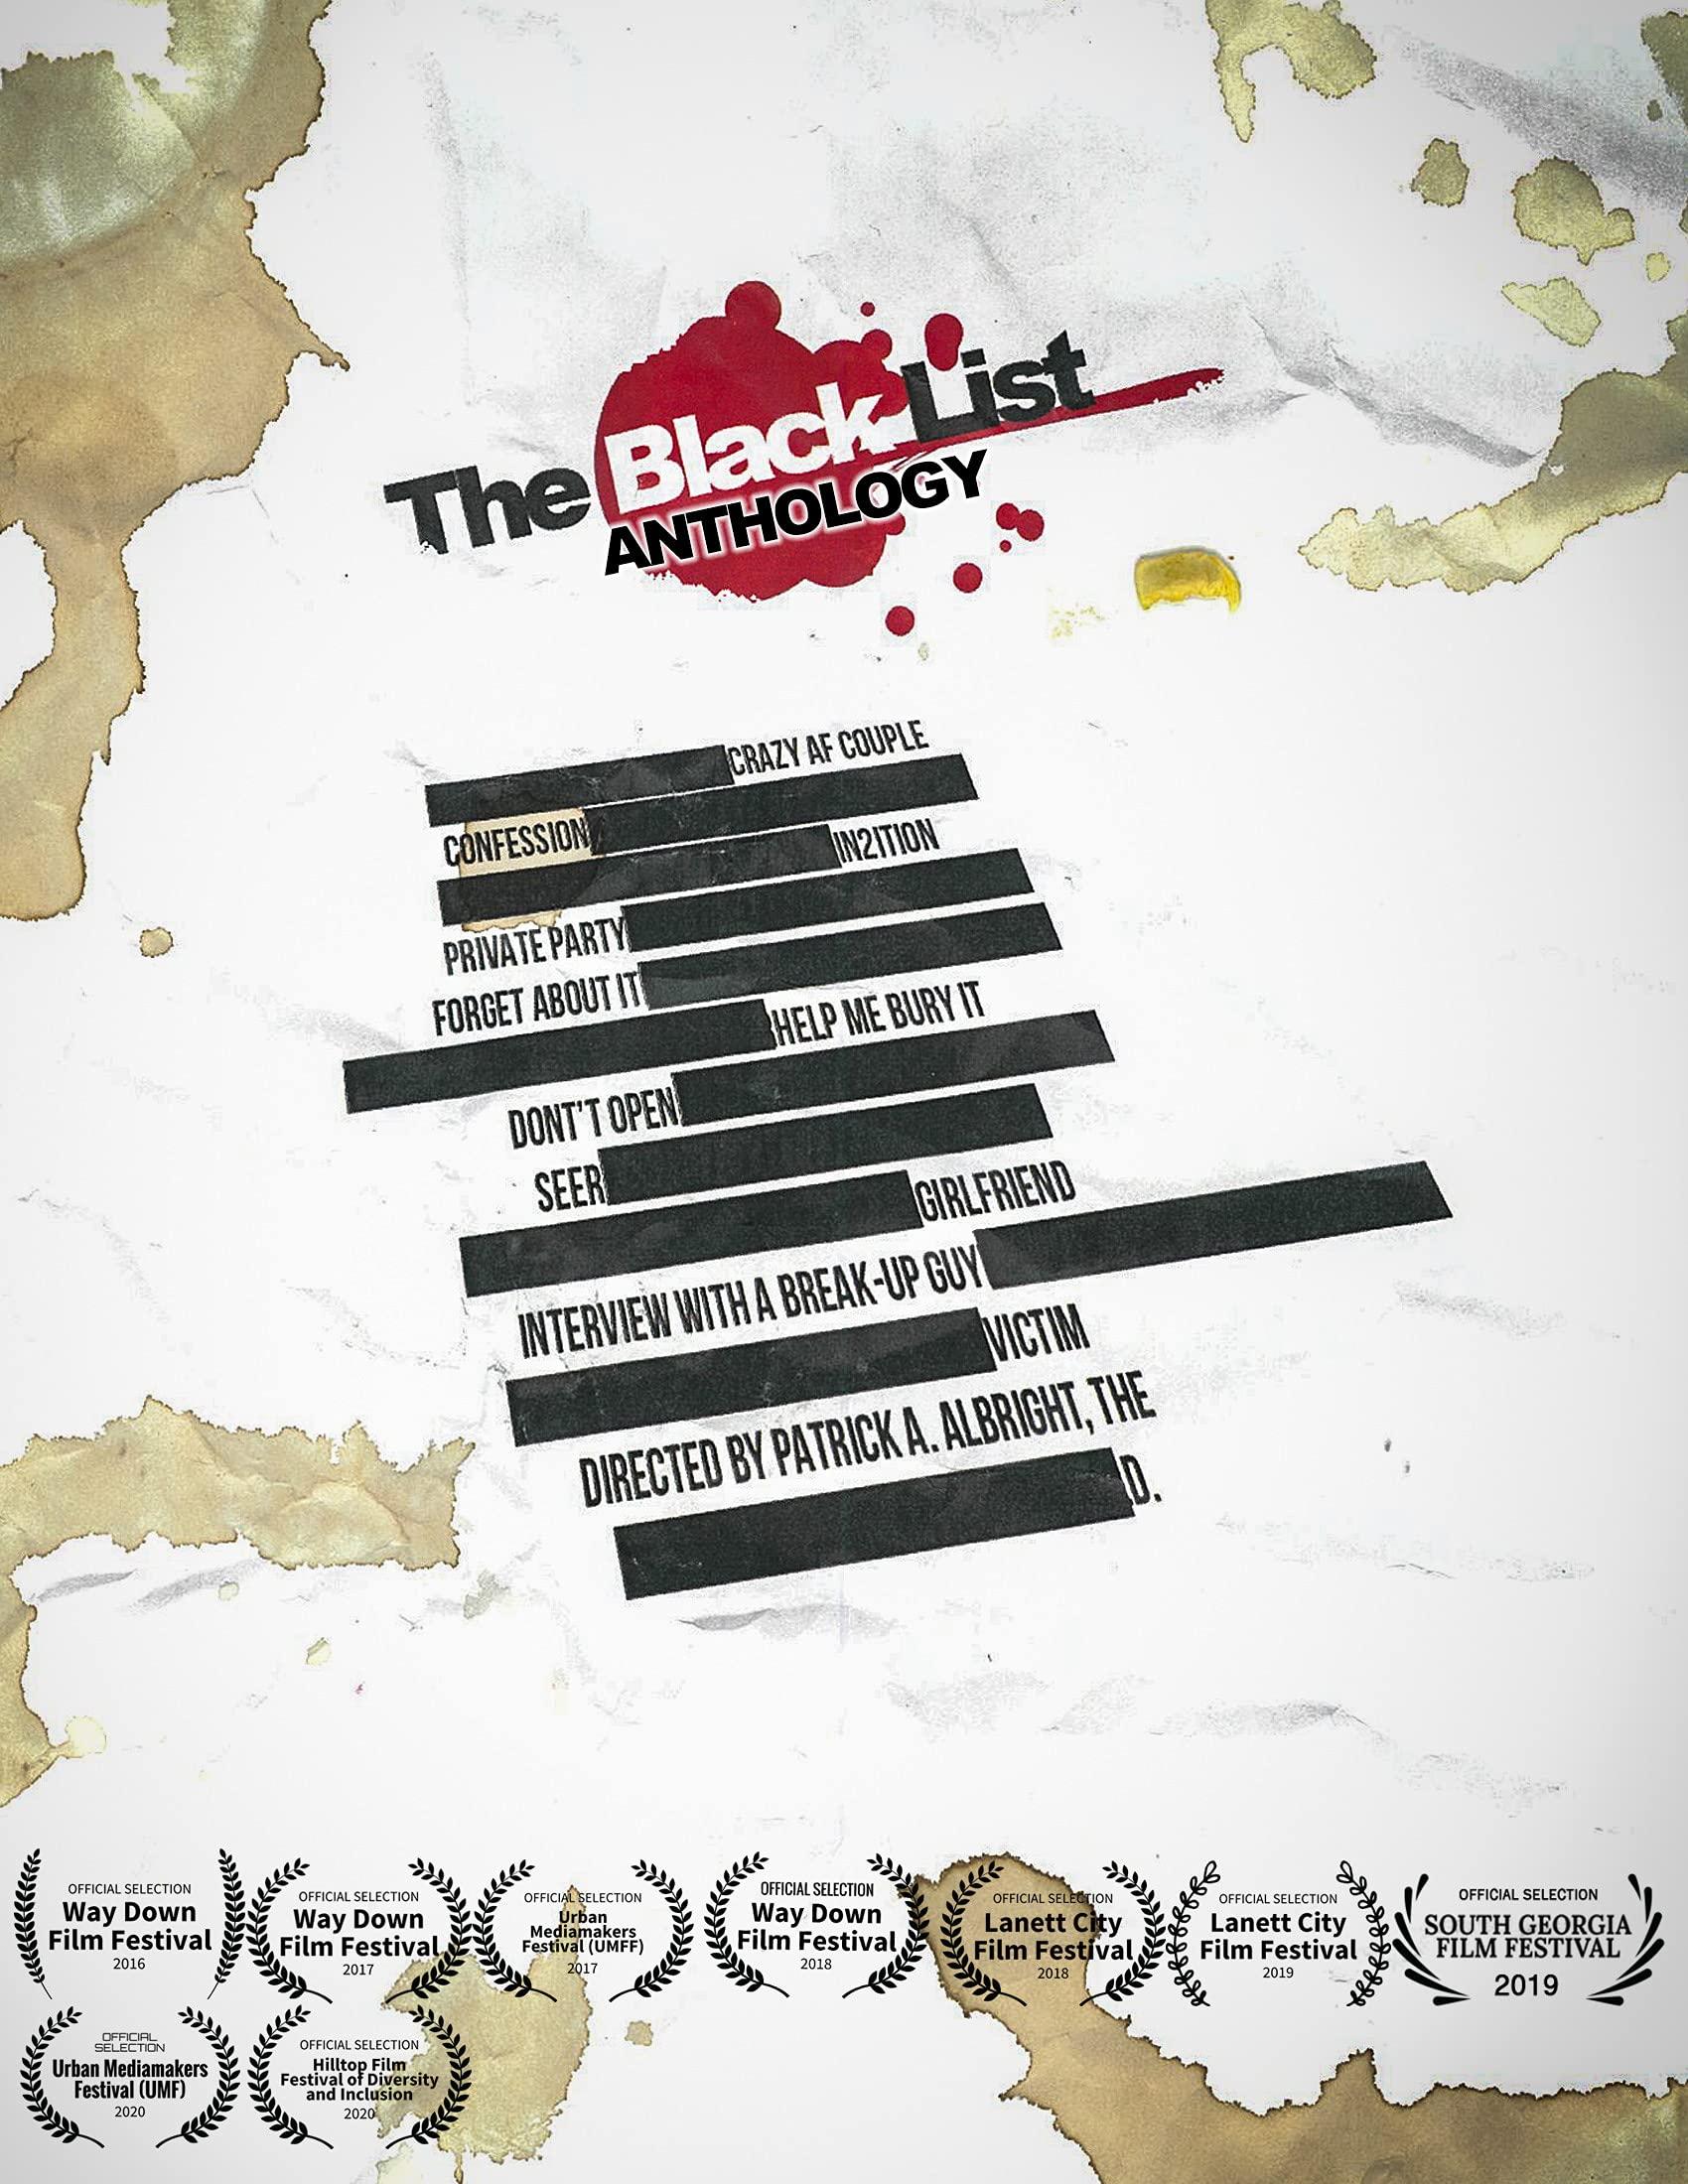 The Black List Anthology